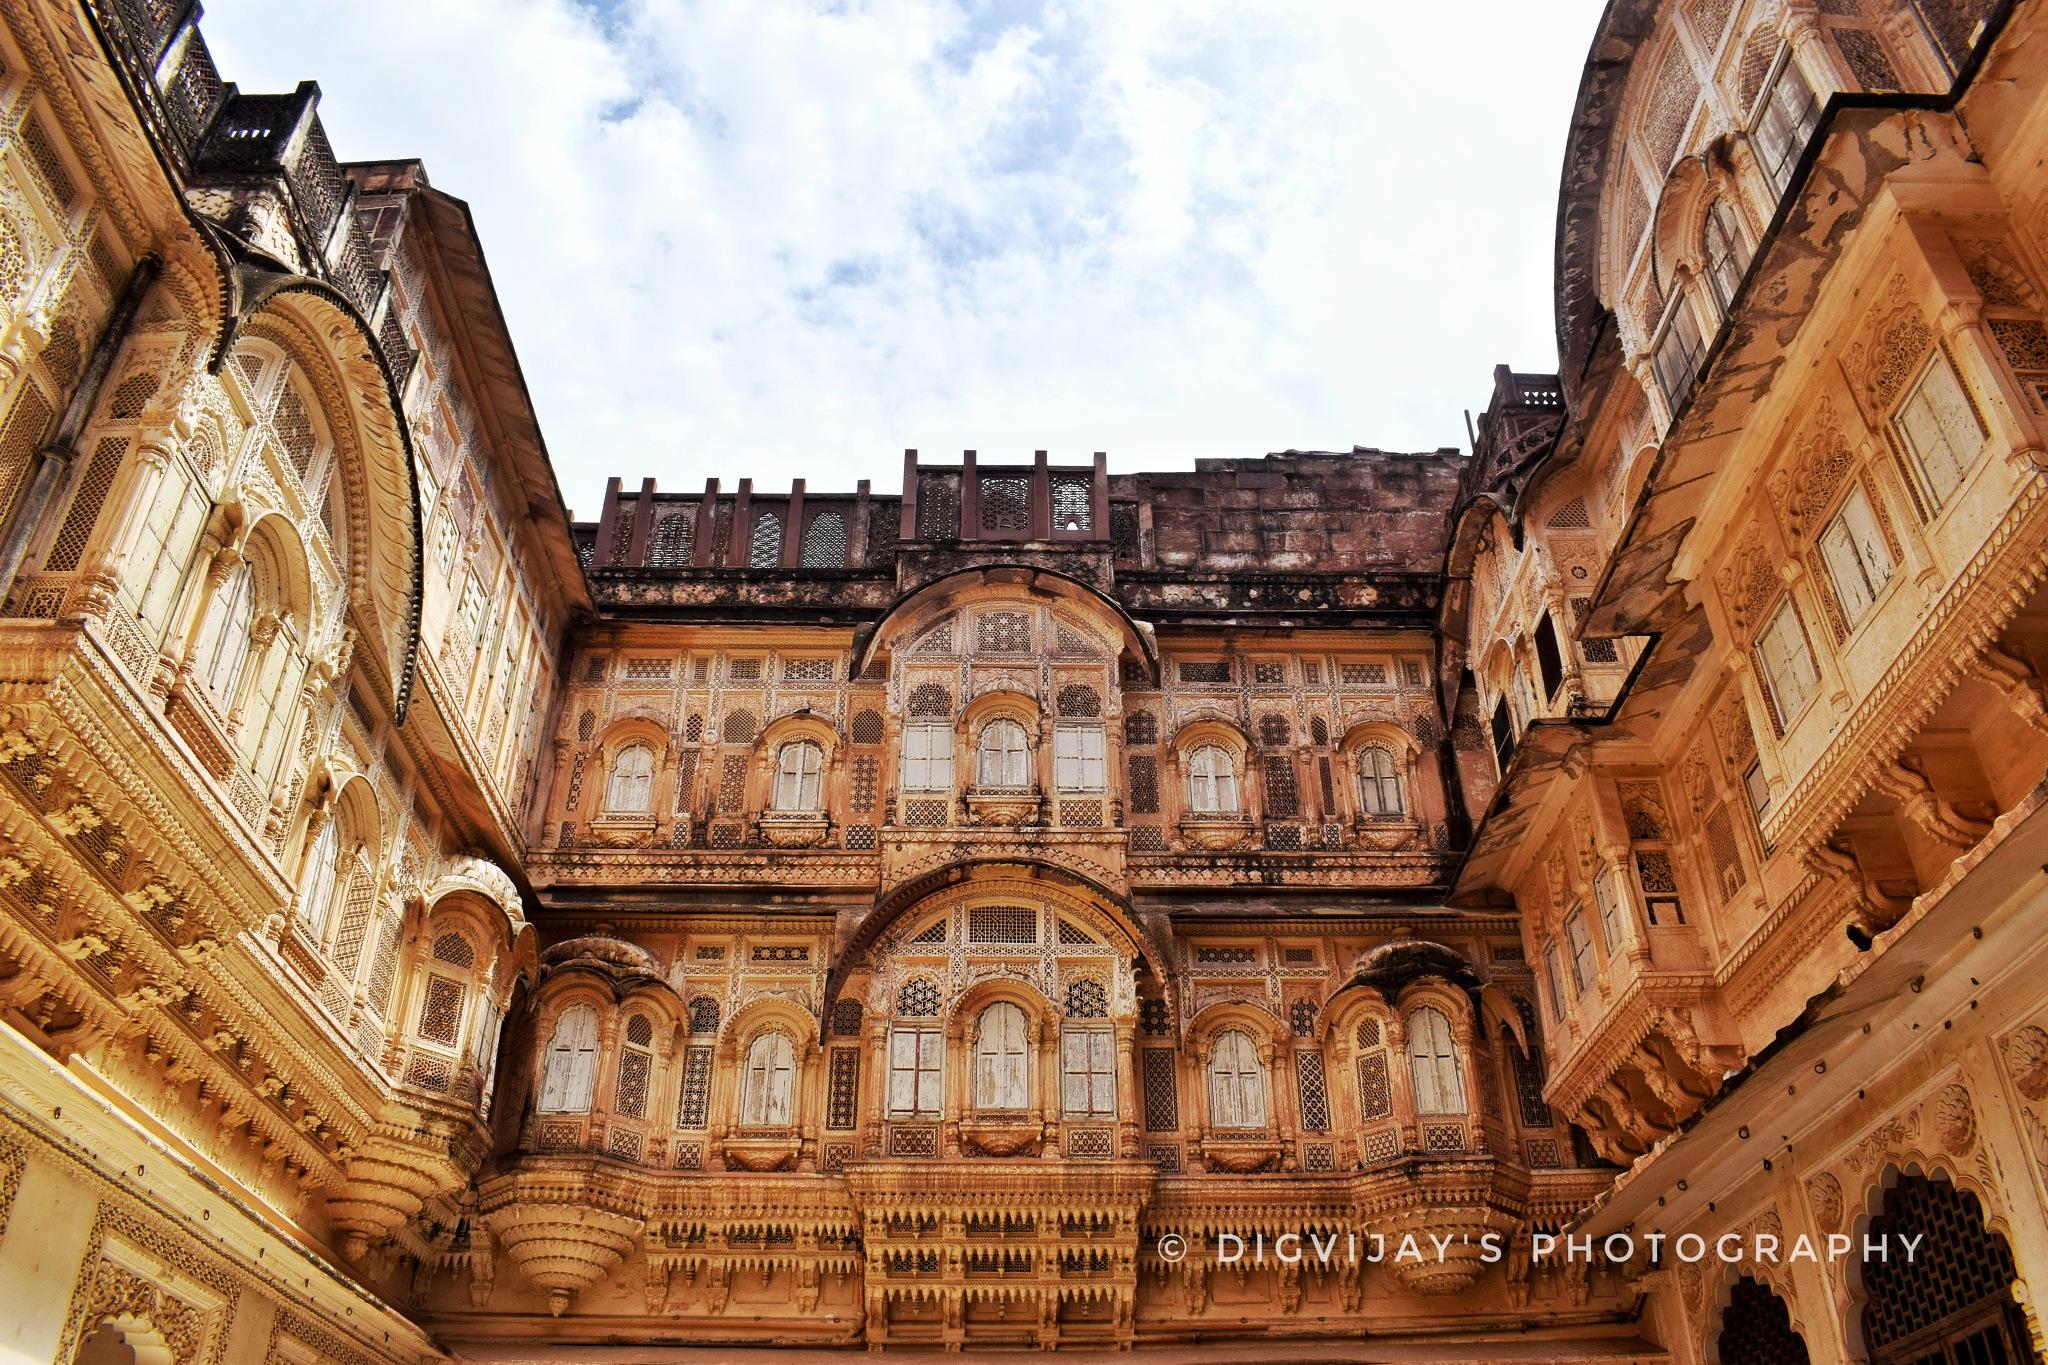 Heharangarh fort by Digvijay Khatri